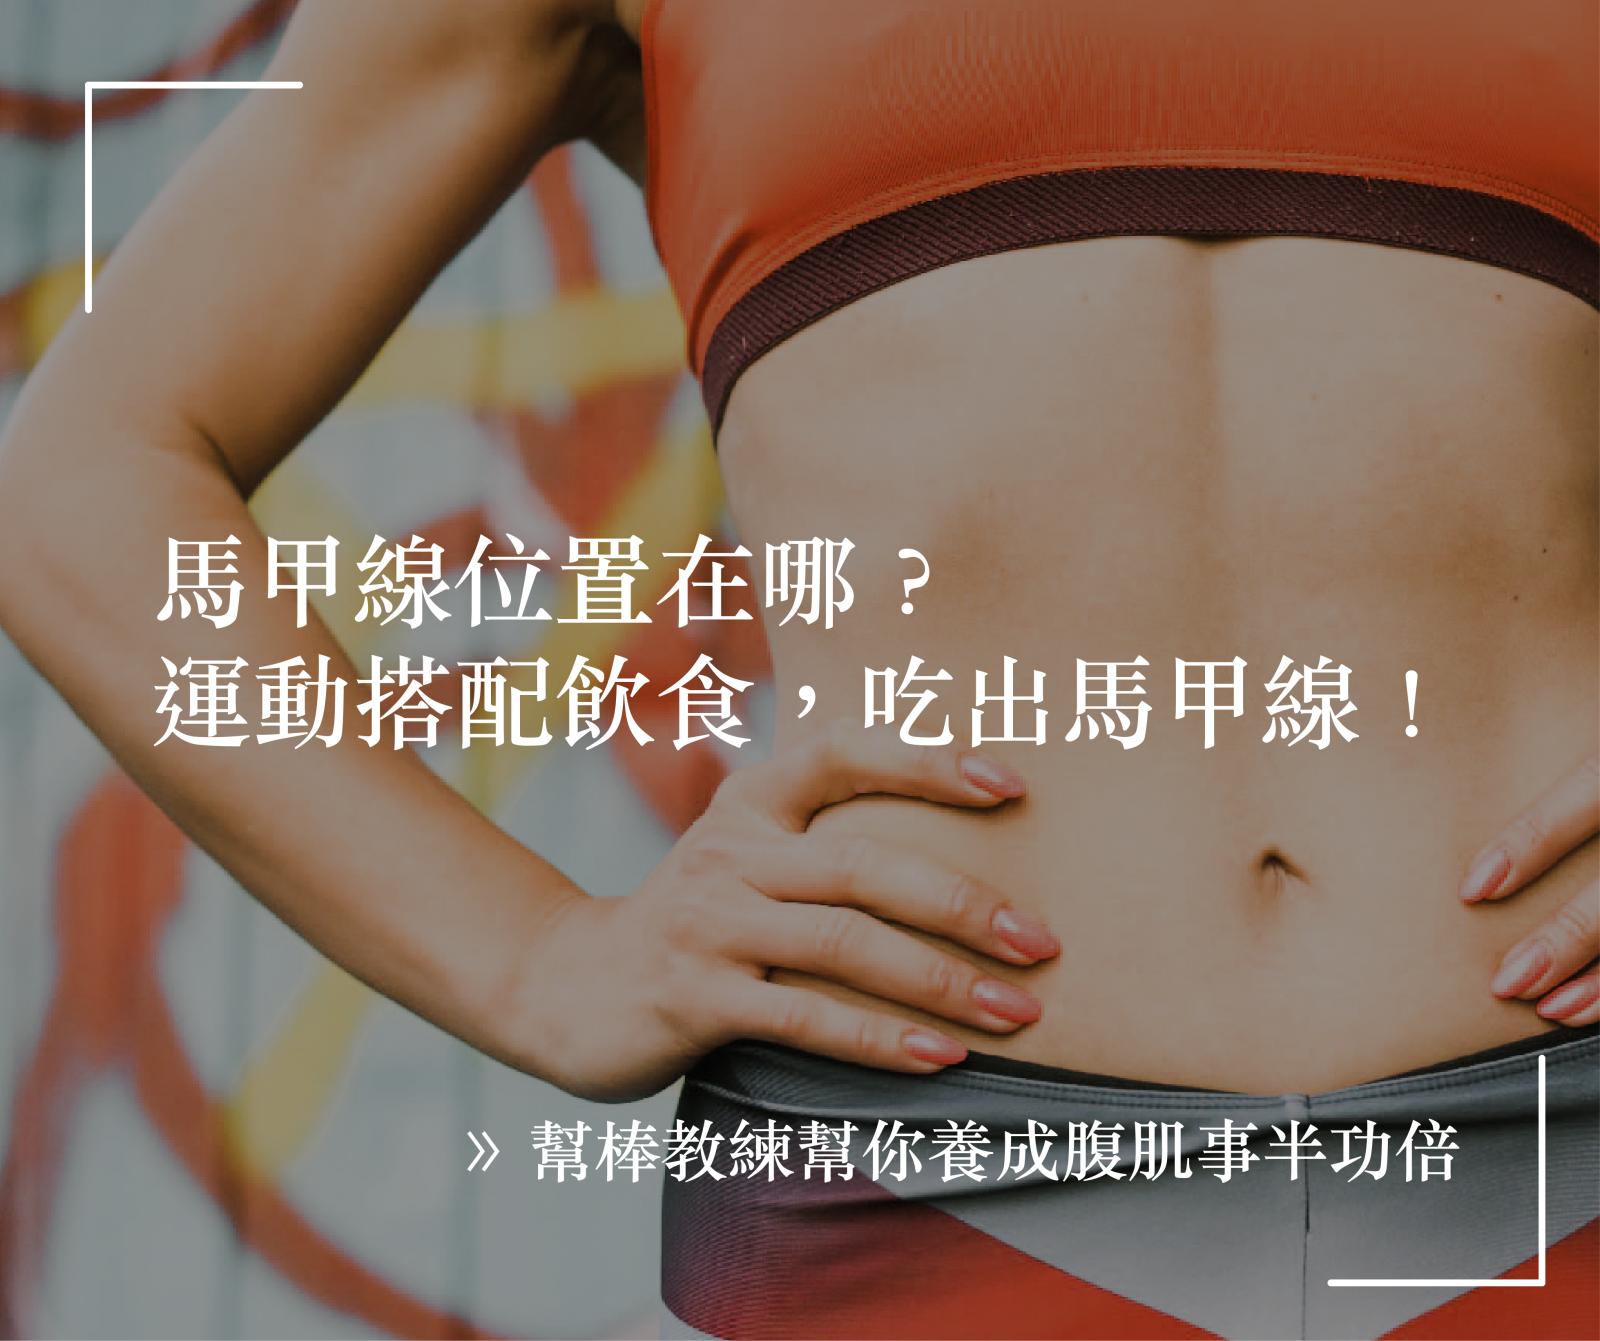 https://www.bounbang.com/blog/ccc8ca506059e438.png